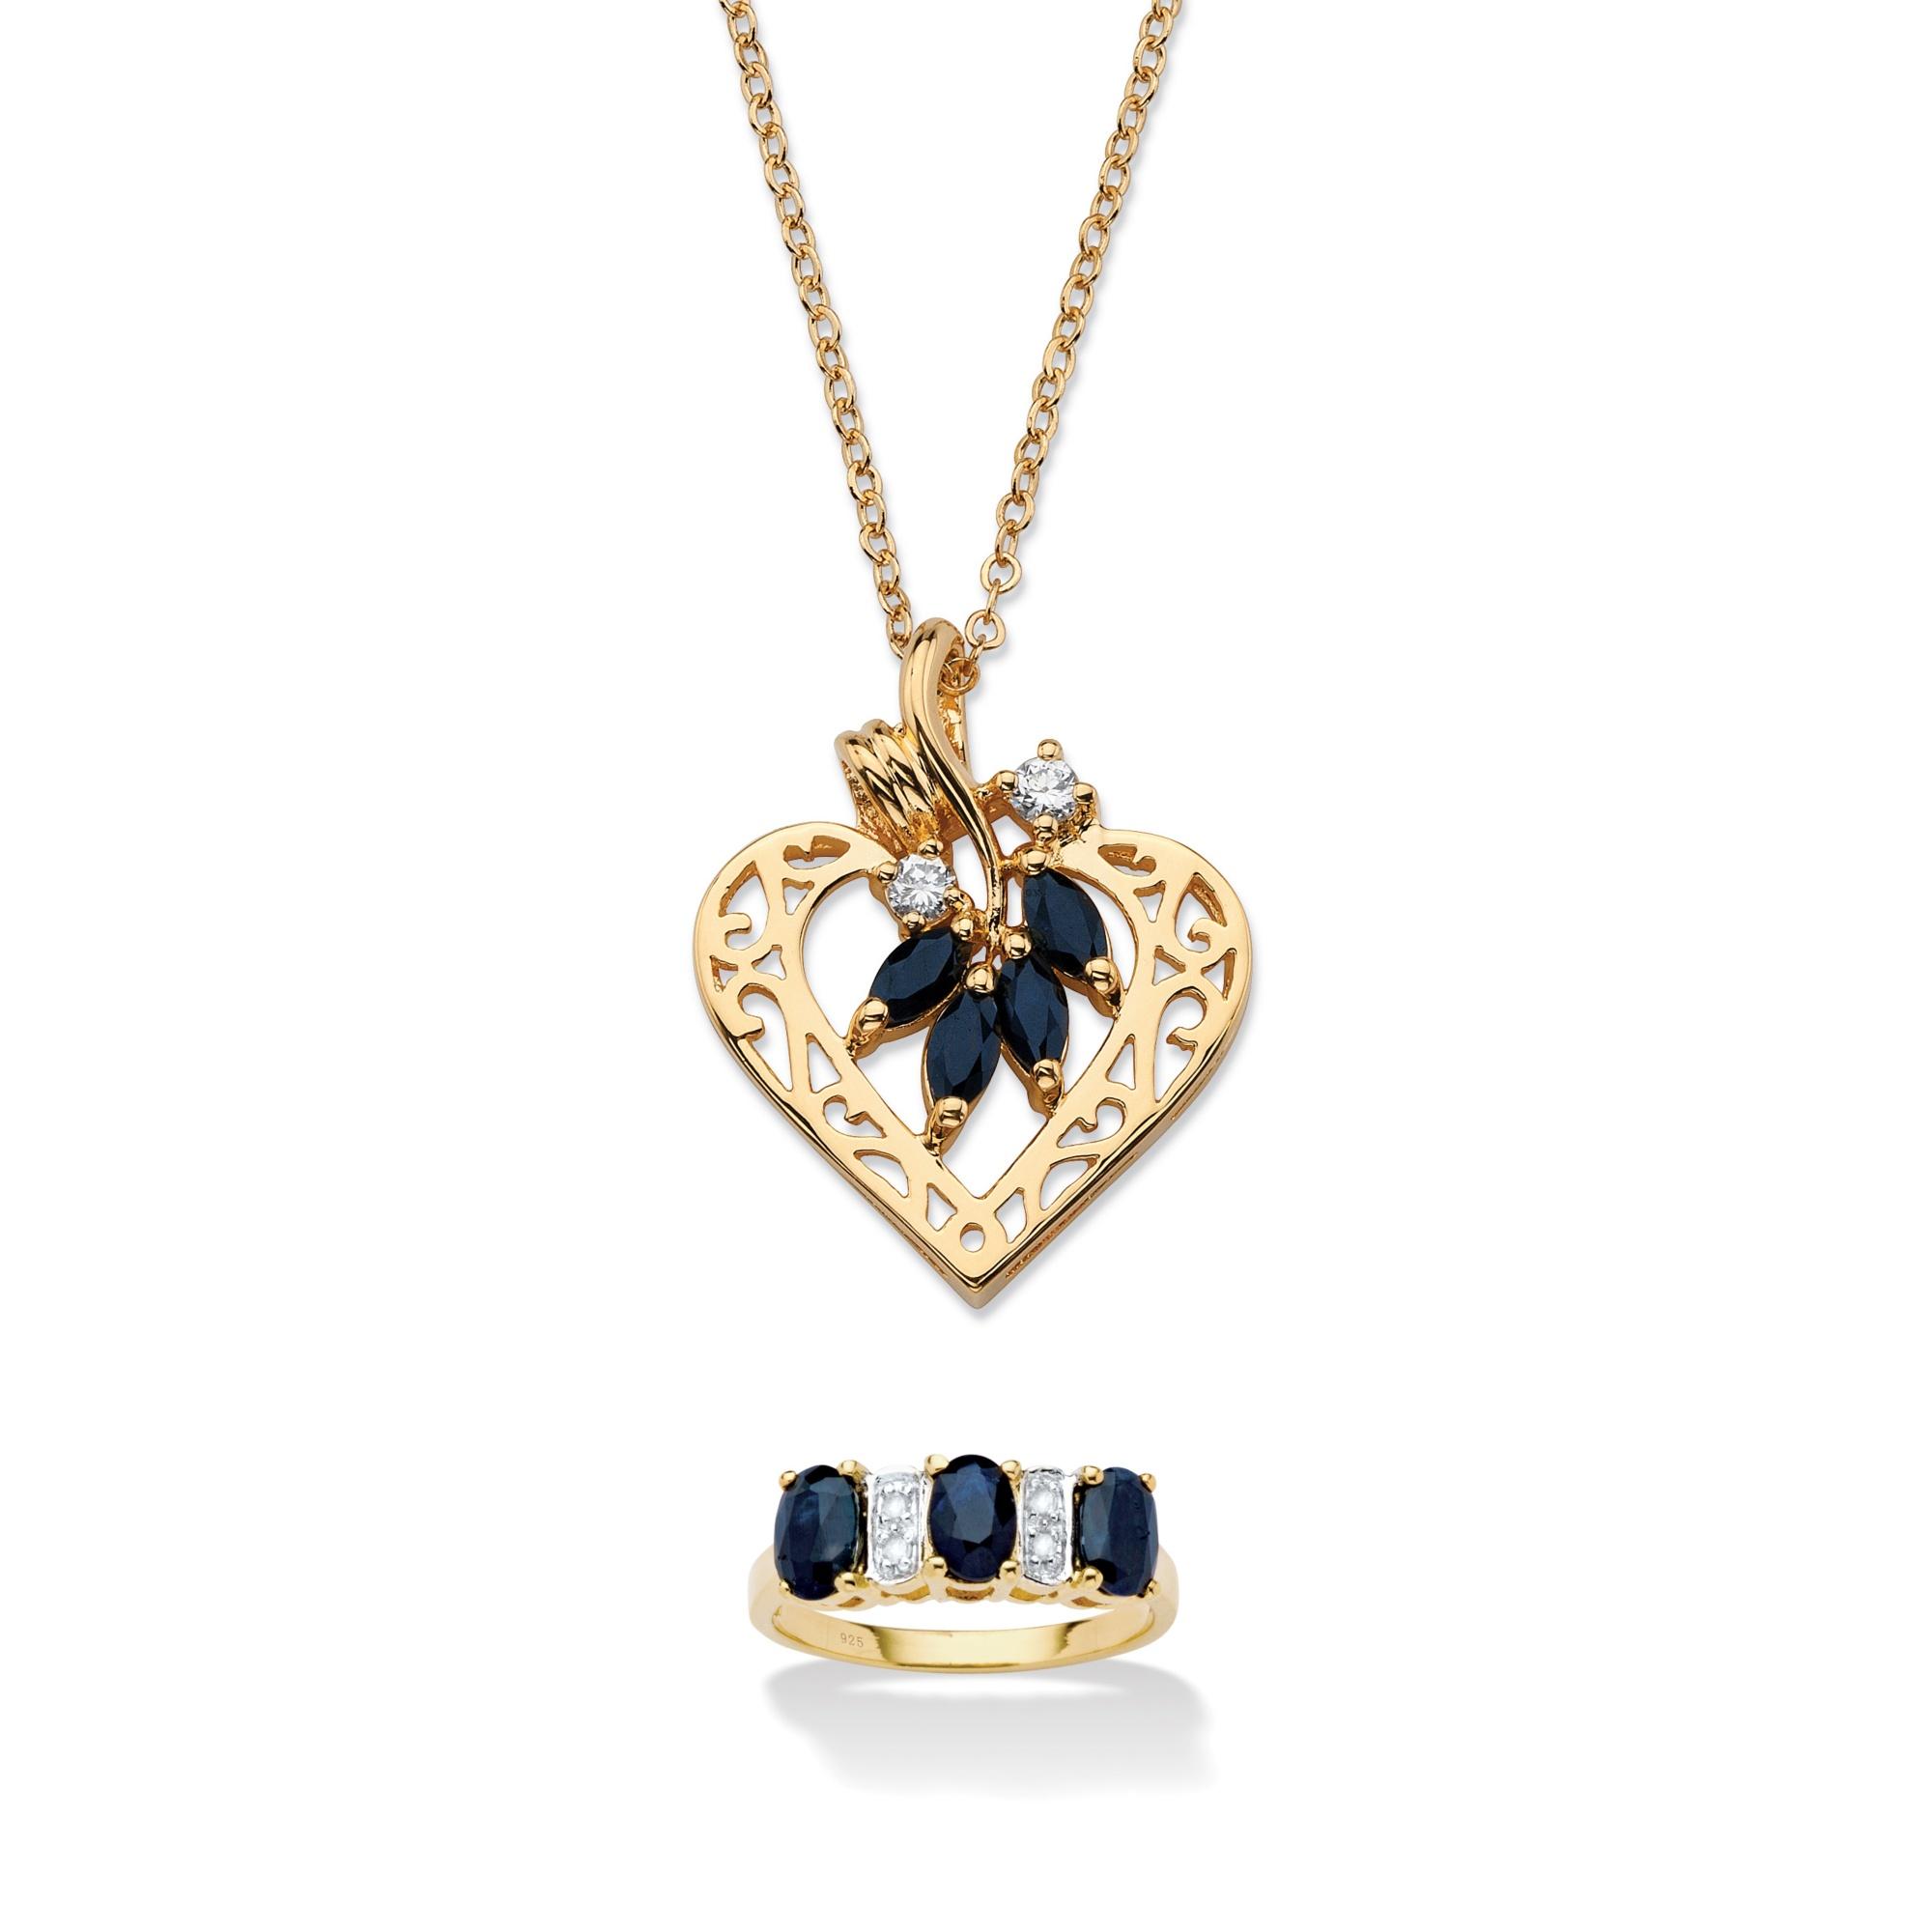 1//2TCW Marquise /& Round Created Diamond Open Heart Pendant 14k Yellow Gold Charm